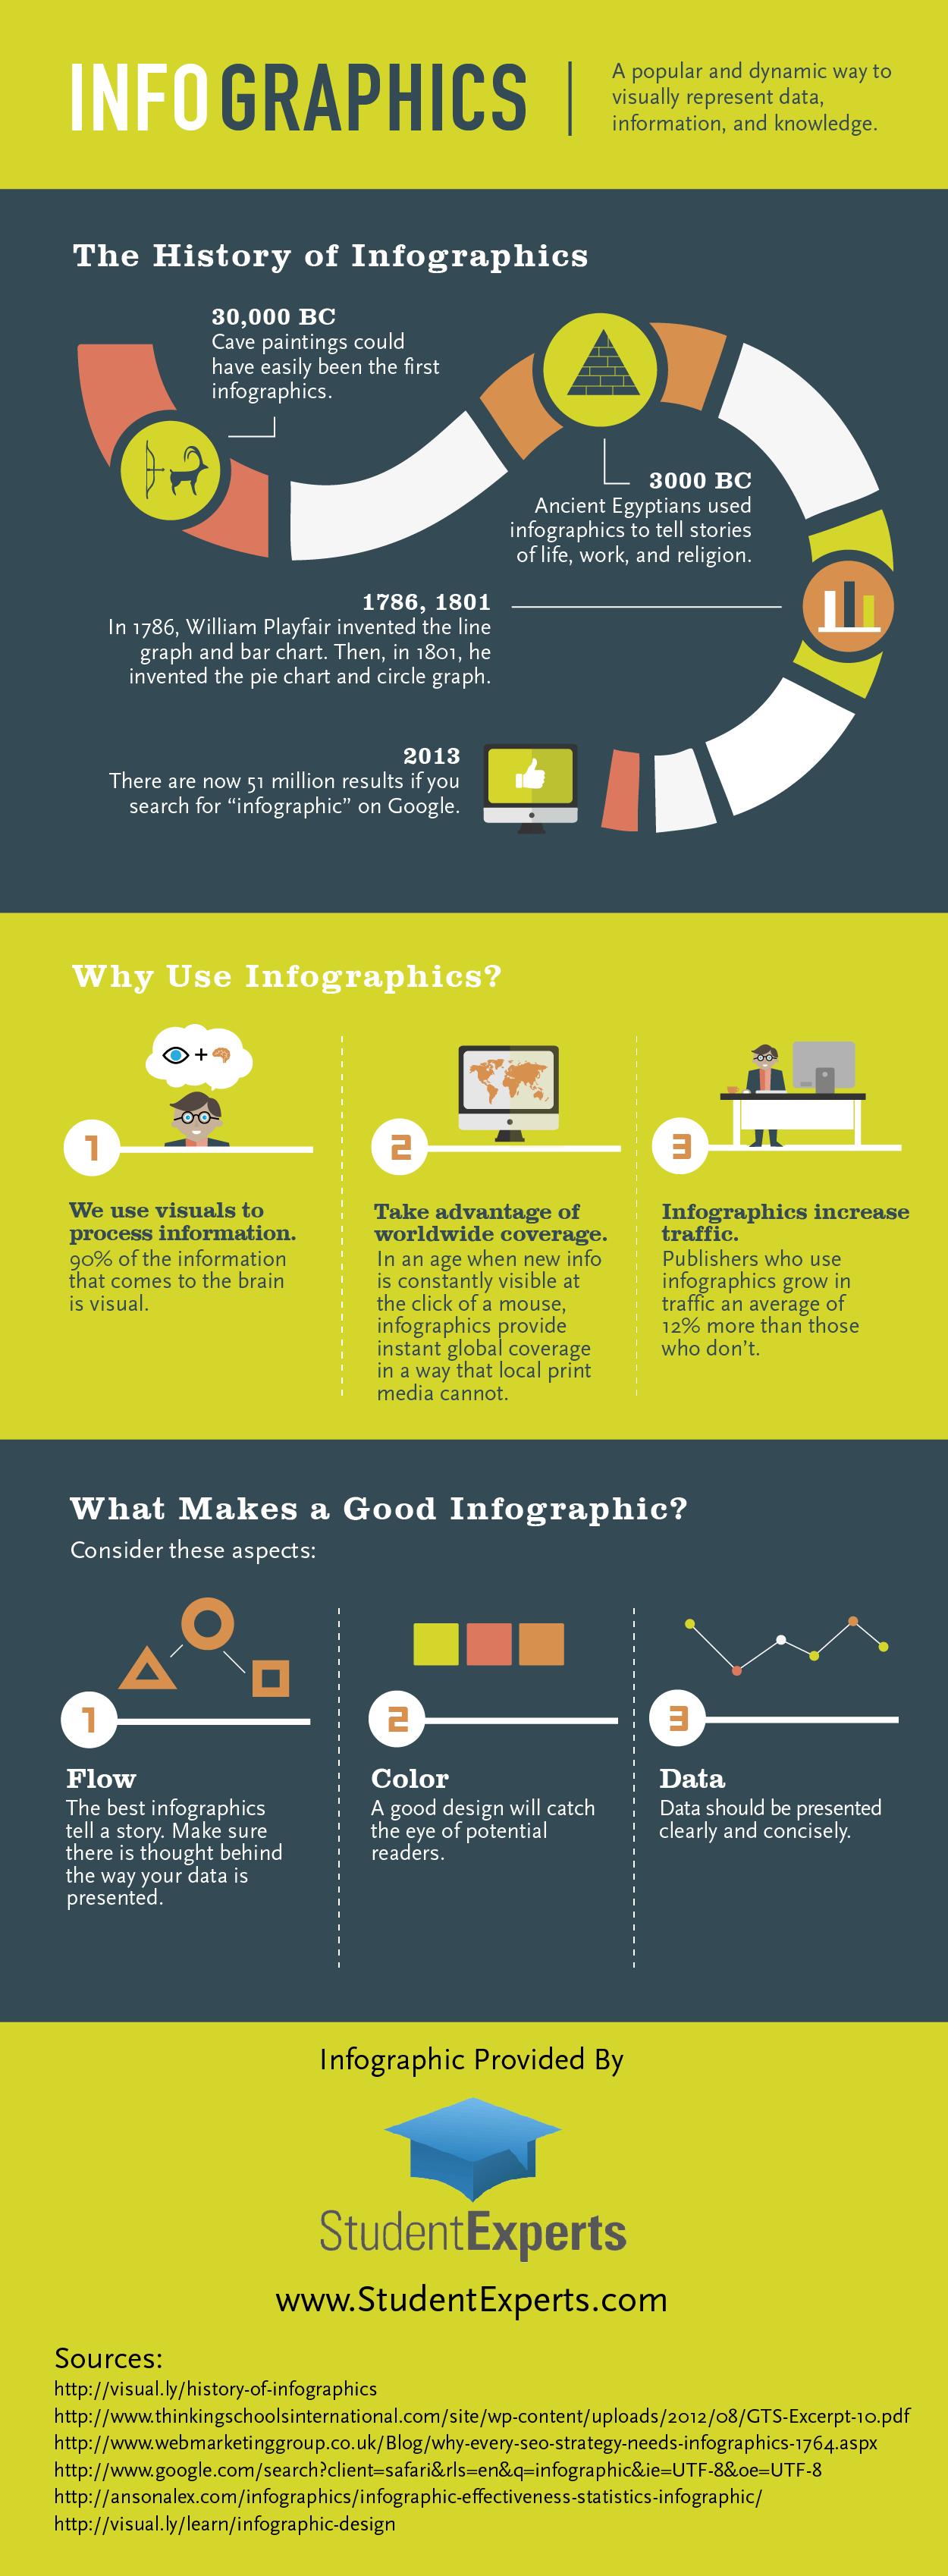 Infographics Infographic!